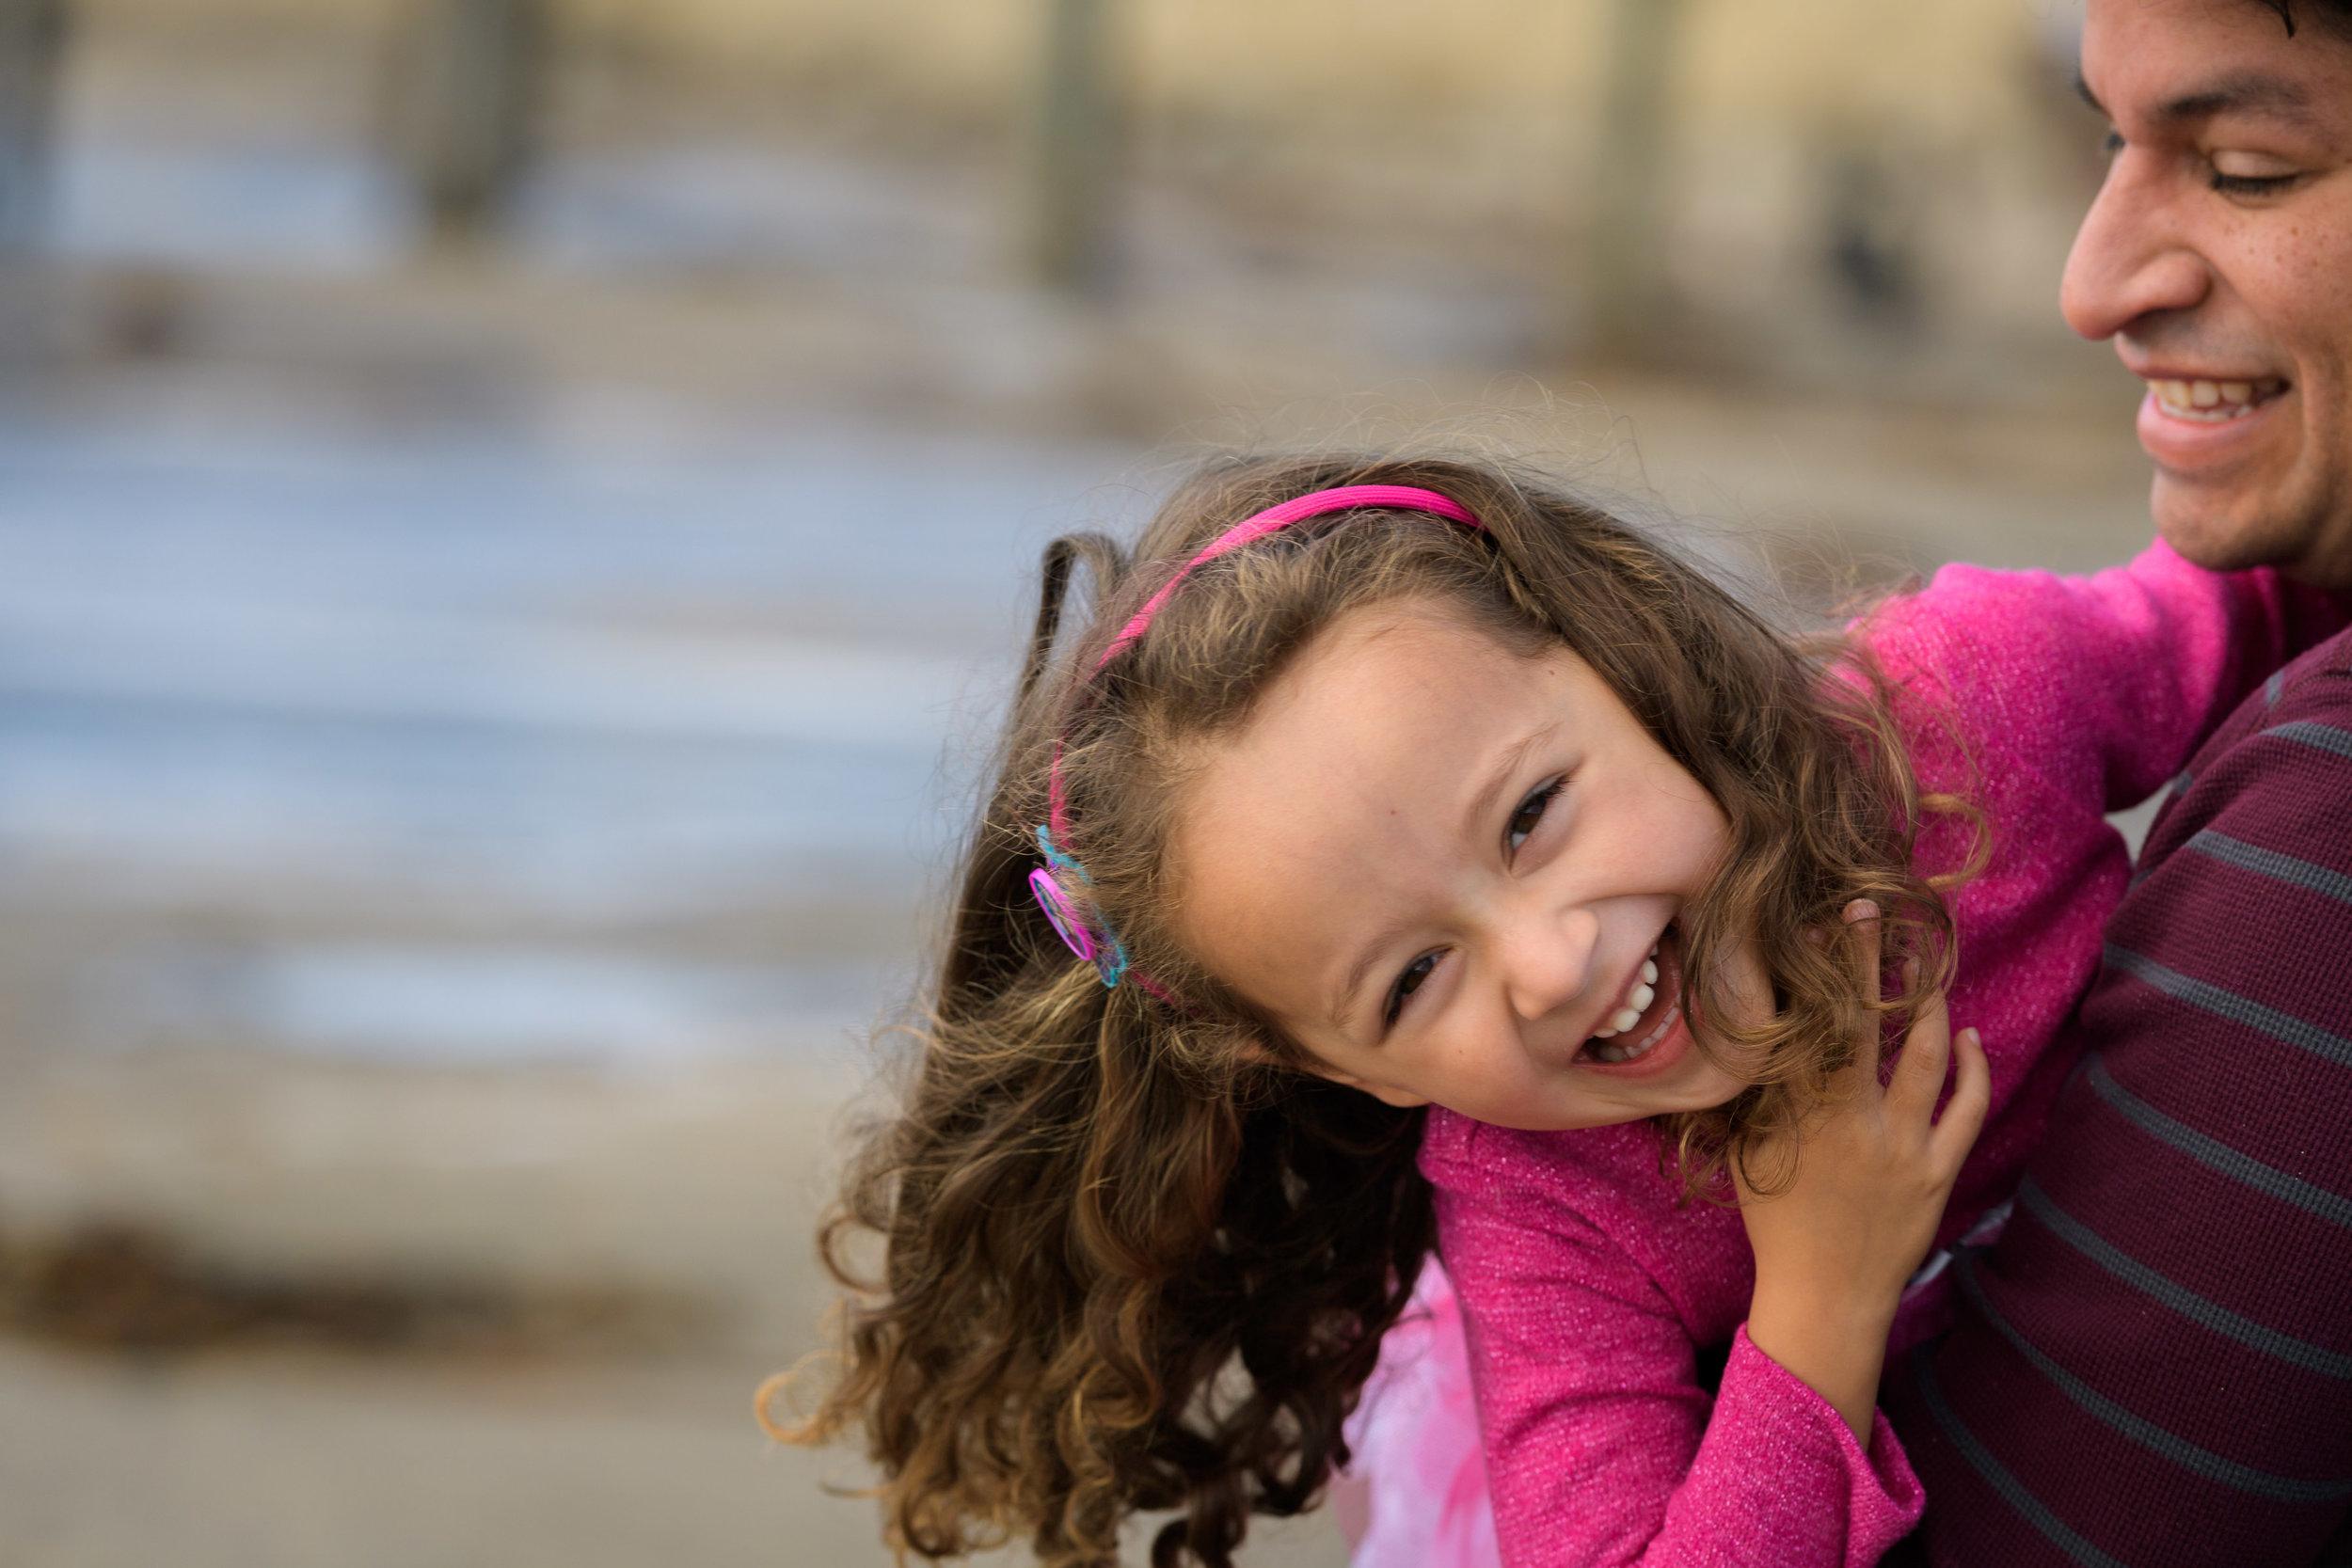 Capitola Beach family photos - by Bay Area portrait photographer Chris Schmauch